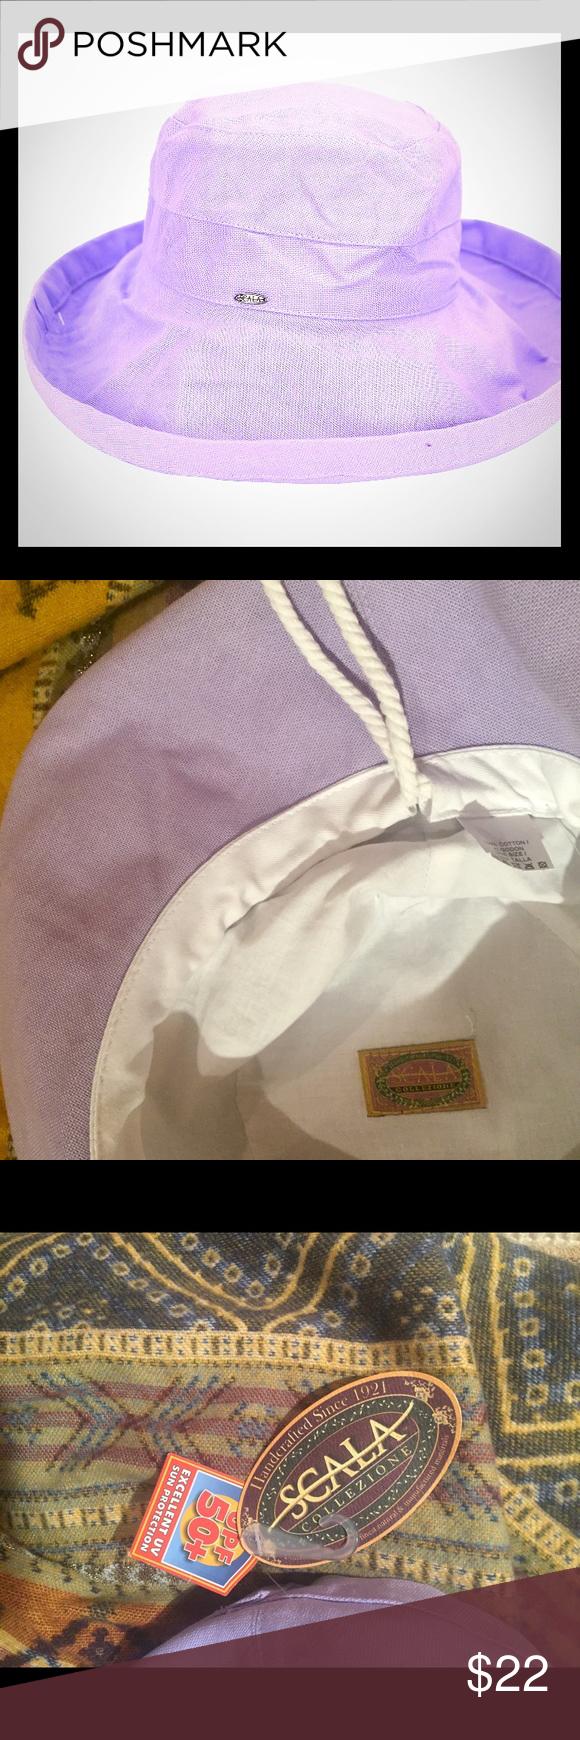 3d0bf11638b Big brim cotton hat w  inner drawstring-lavender Women s Scala big brim  cotton hat with inner drawstring. Pretty lavender color. (White hat not  available.